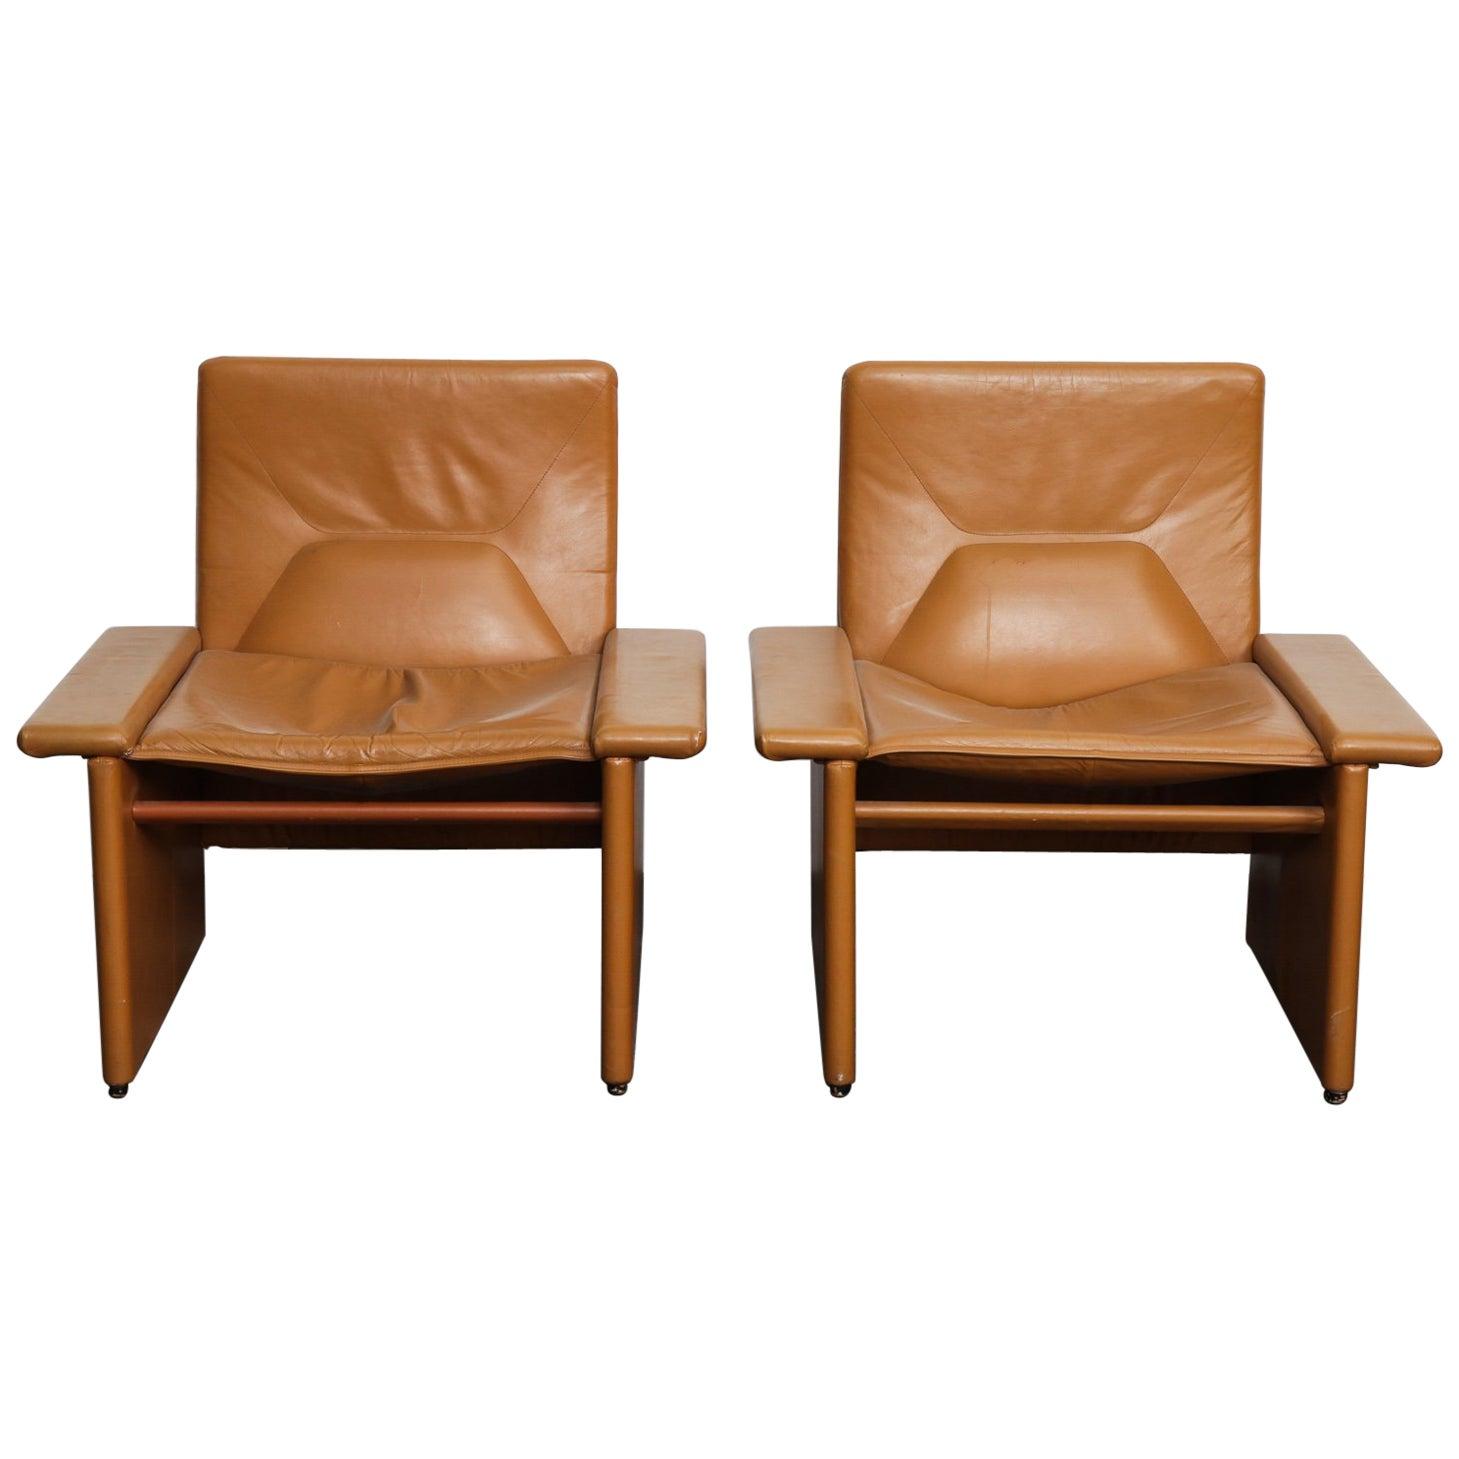 Pair of 1970s Italian Cognac Original Leather Modern Lounge Chairs